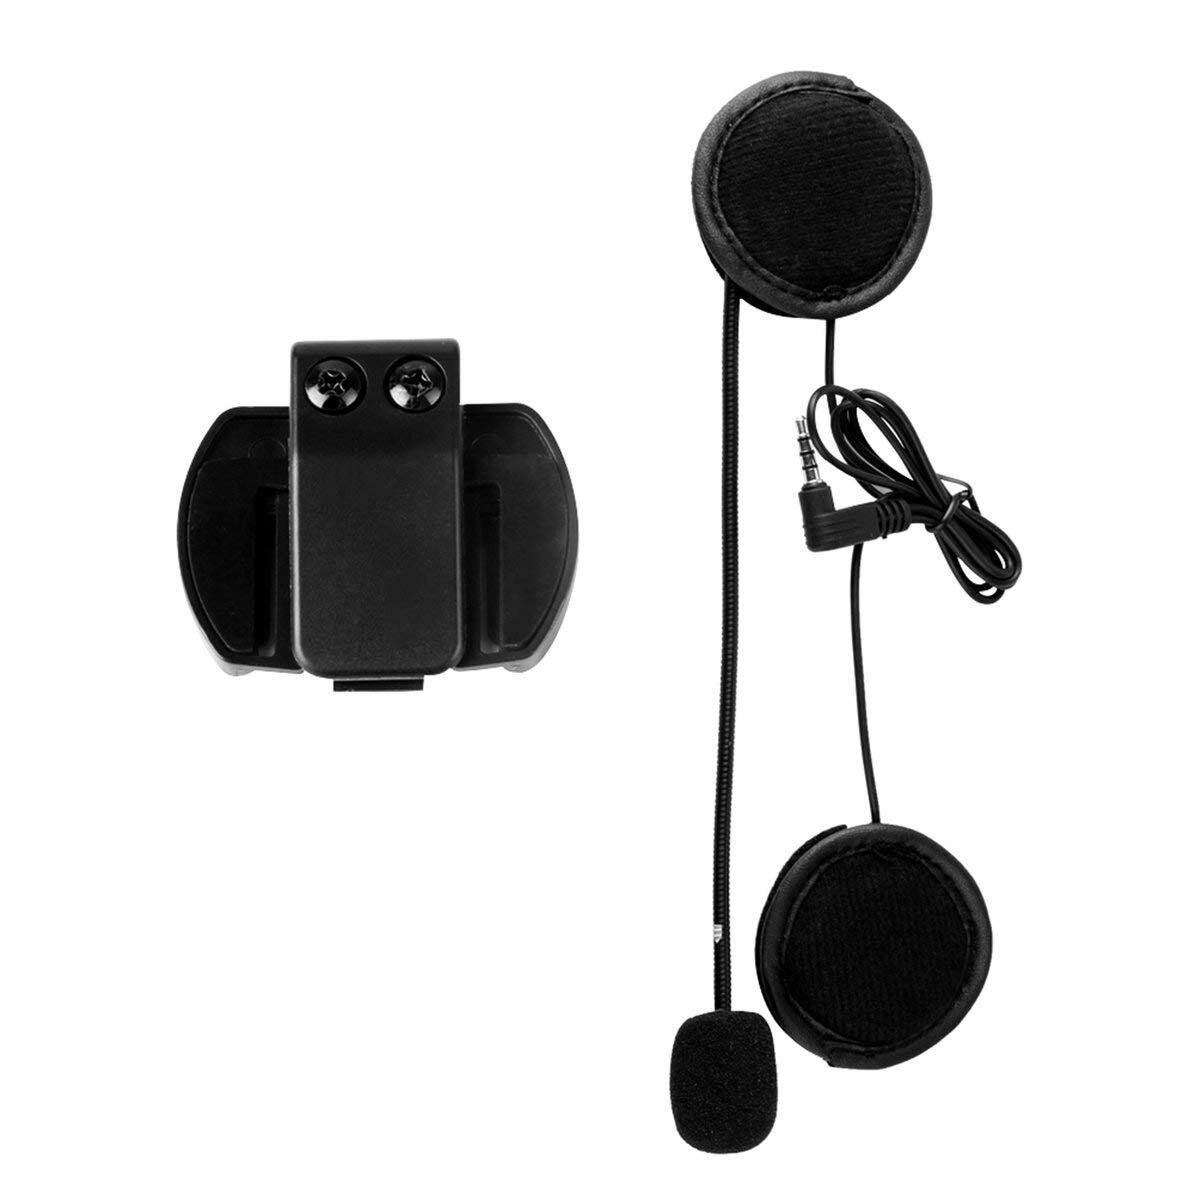 V6 akcesoria głośnik mikrofonu i klip tylko garnitur dla V6-1200 hełmofonu motocykl domofon bluetooth 3.5Mm Jack Pl